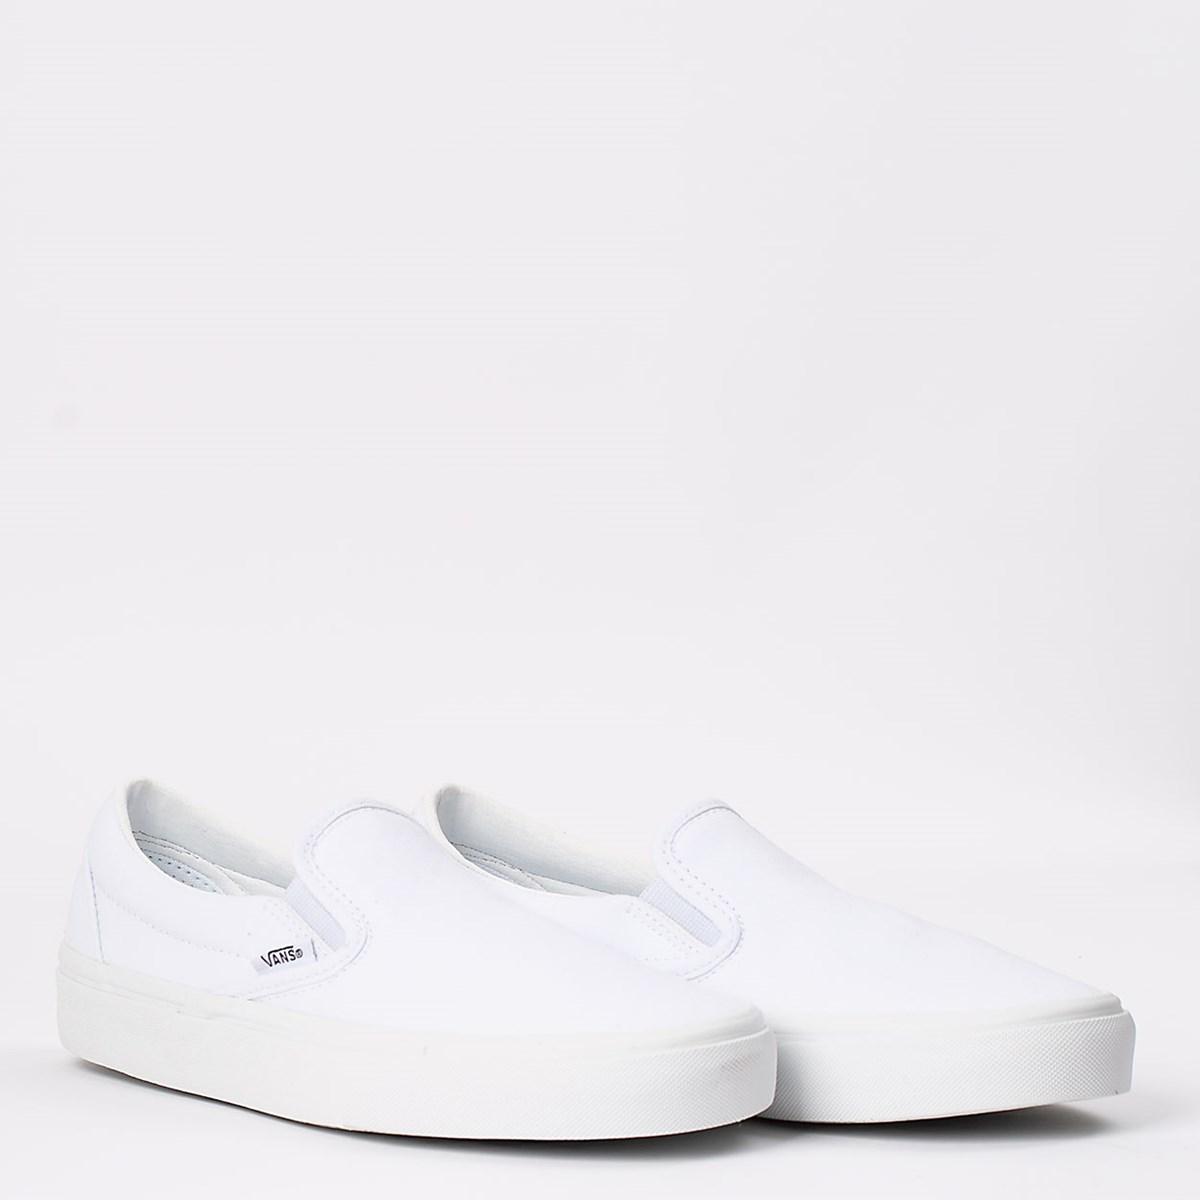 Tênis Vans Classic Slip-On True White VN000EYEW00